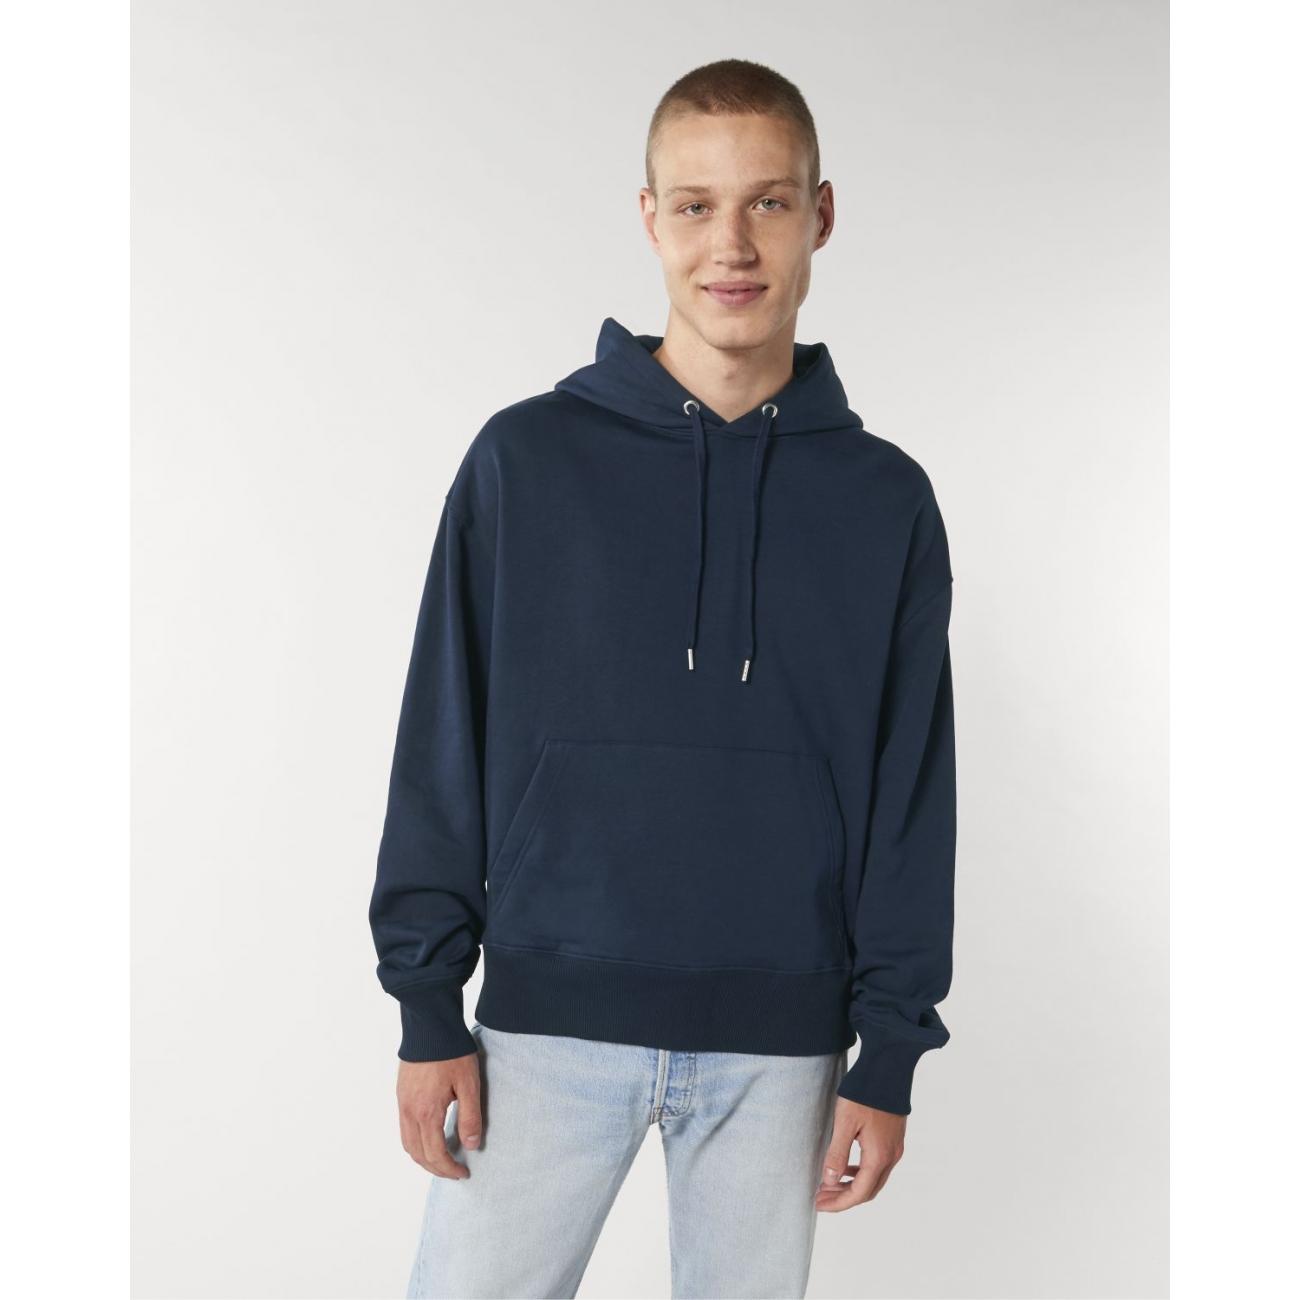 https://tee-shirt-bio.com/10523-thickbox_default/sweat-capuche-oversize-coton-bio-bleu-marine.jpg